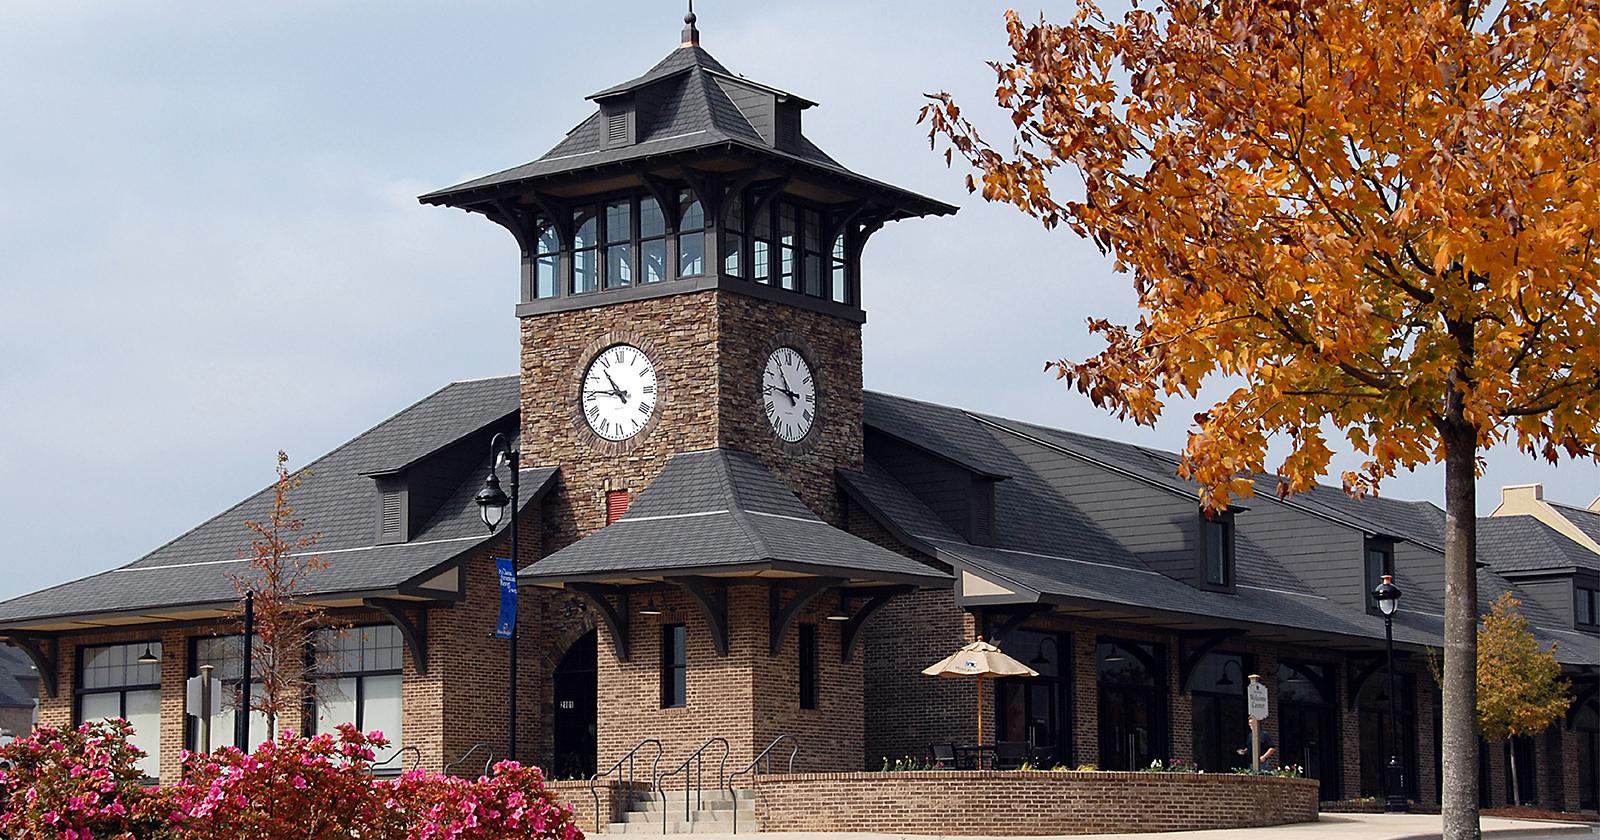 The Town Center at Ross Bridge, Birmingham, AL